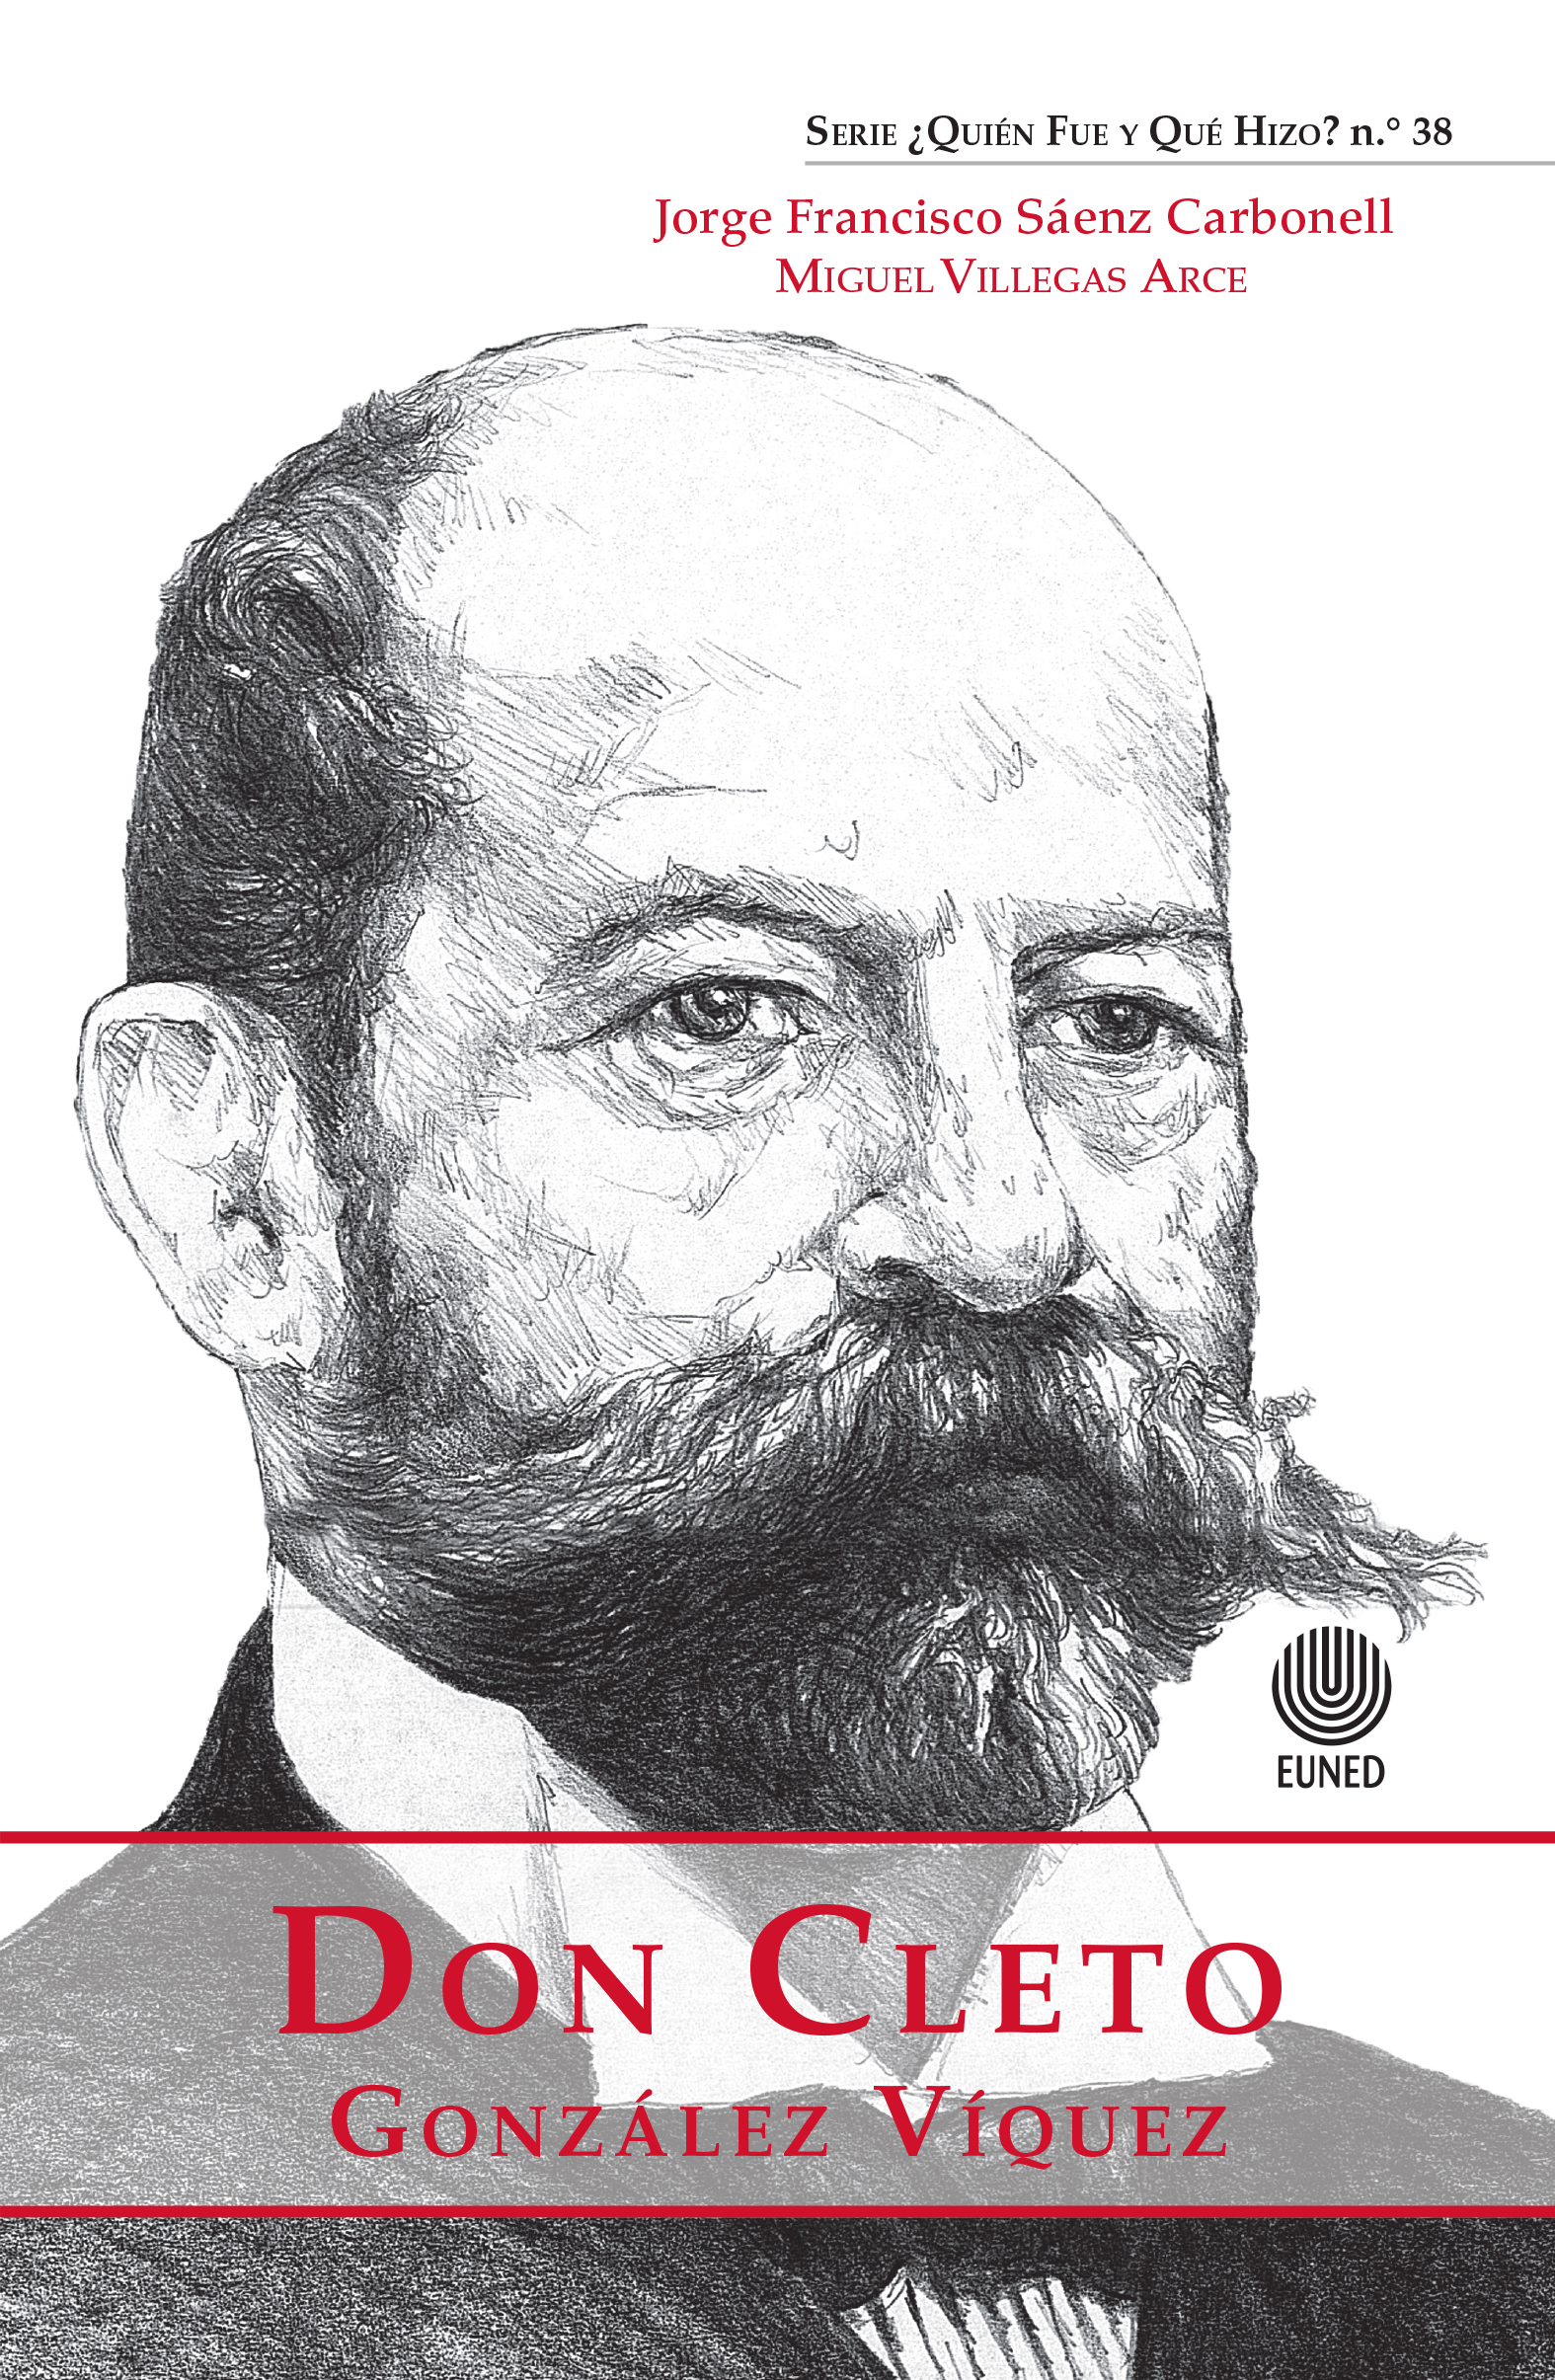 Don Cleto González Víquez